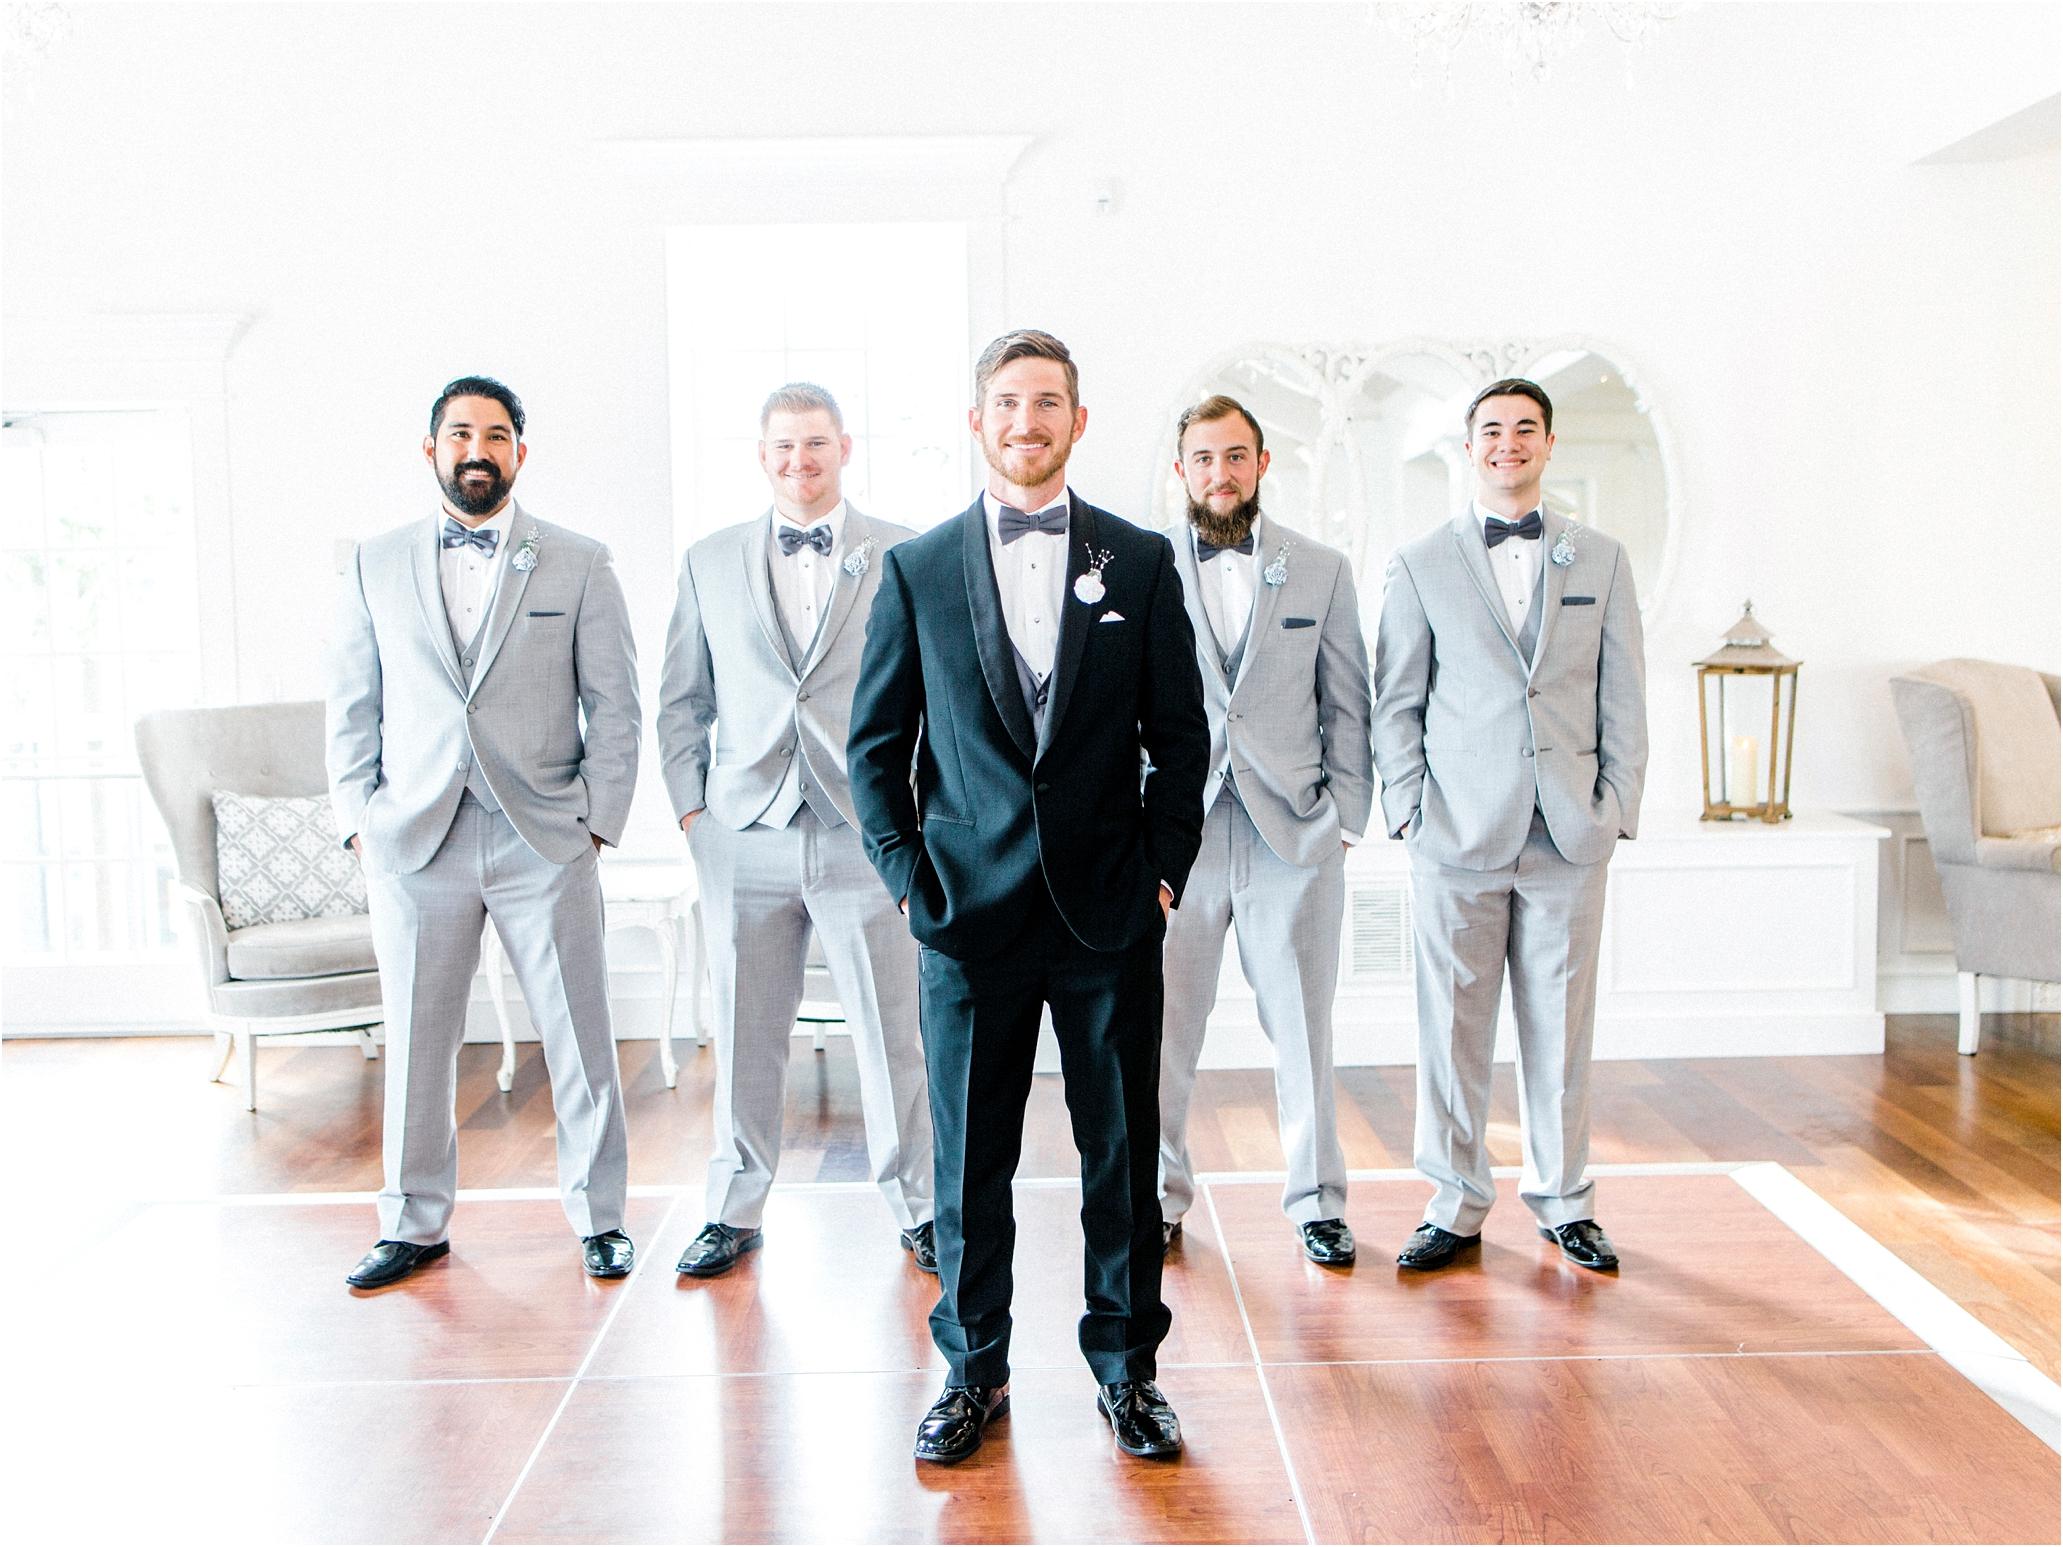 Lisa Silva Photography- Ponte Vedra Beach and Jacksonville, Florida Fine Art Film Wedding Photography- Wedding at The White Room Villa Blanca in St. Augustine, Florida_0031.jpg